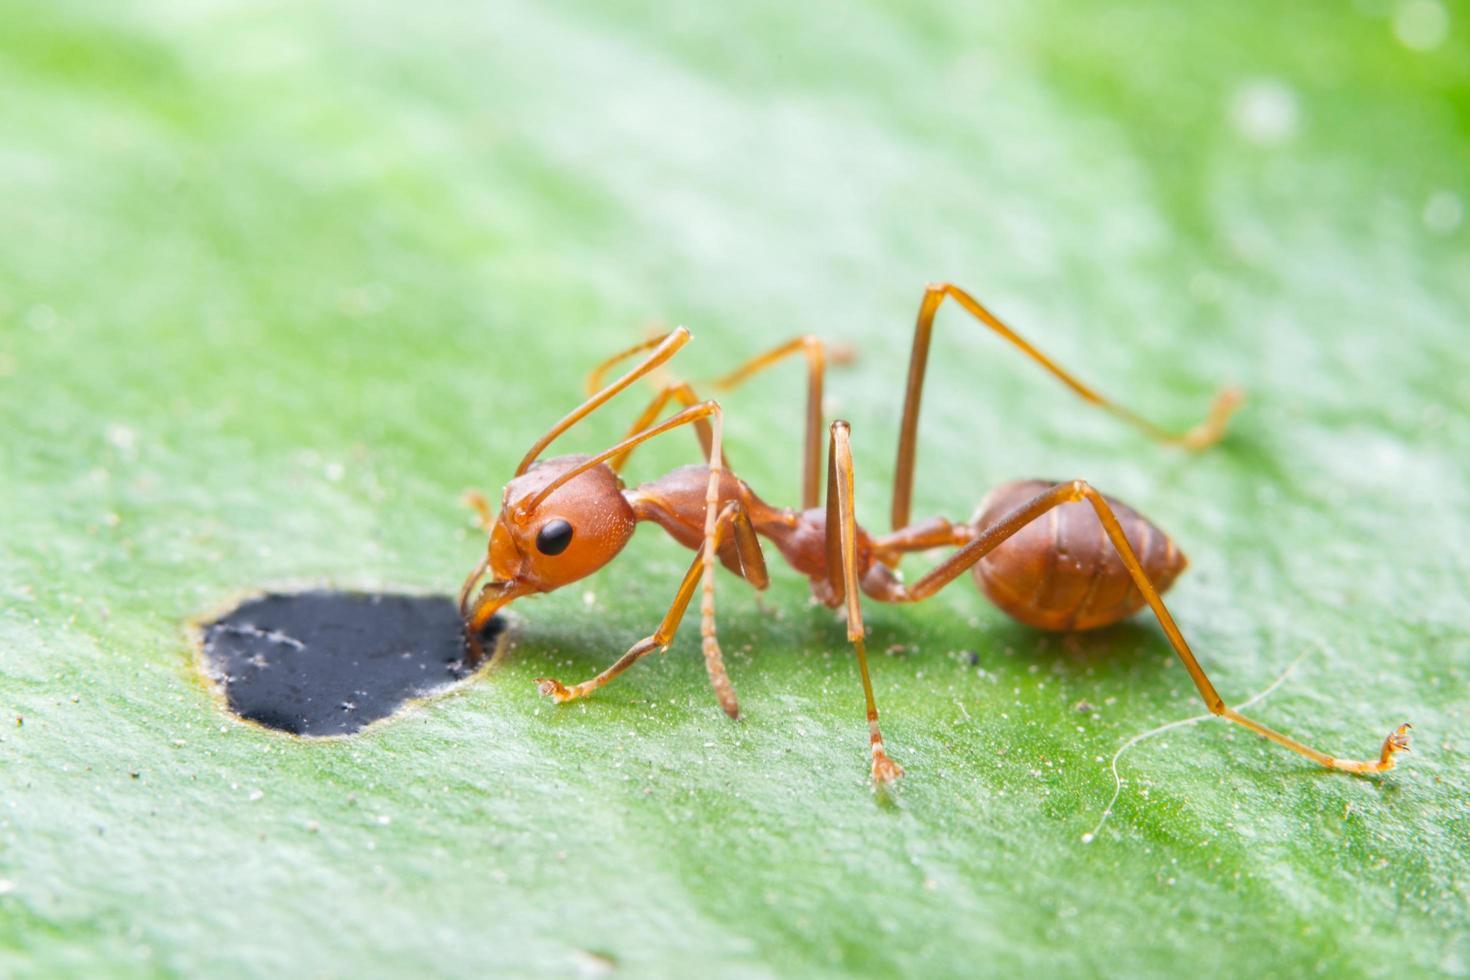 fourmi macro sur feuille verte photo